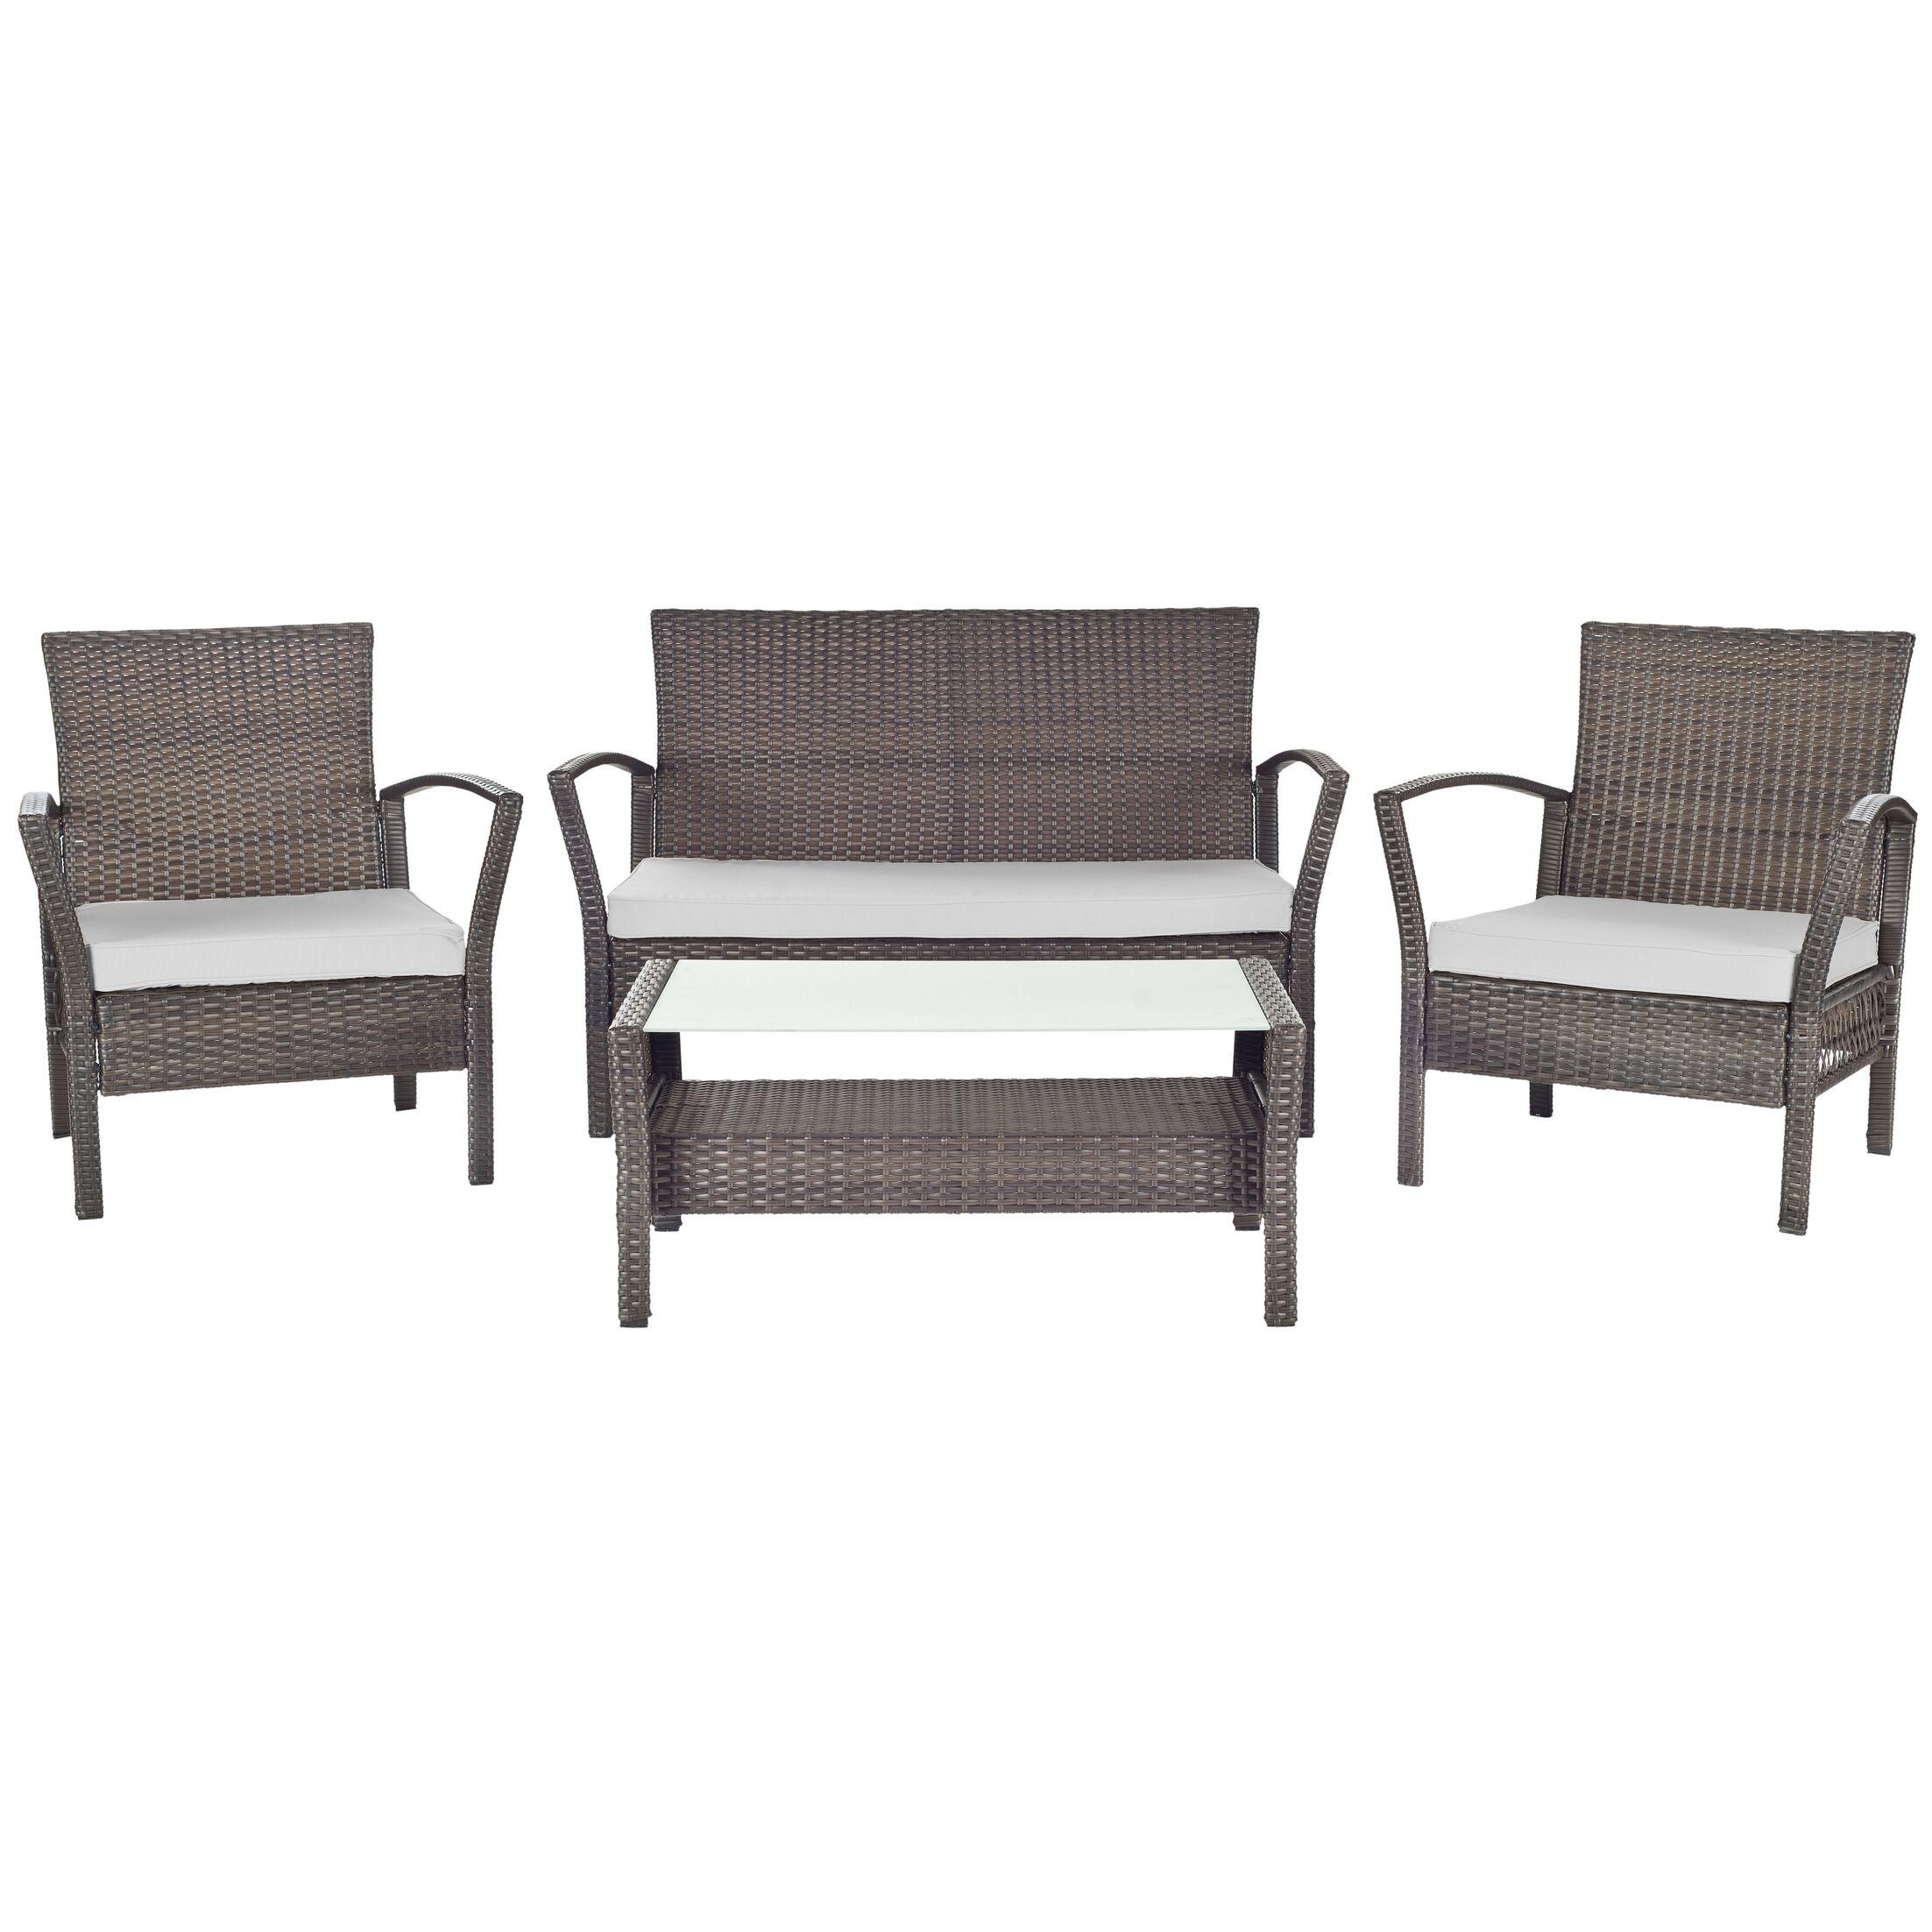 Avaron 4 Piece Sofa Set with Cushions Fabric: Grey